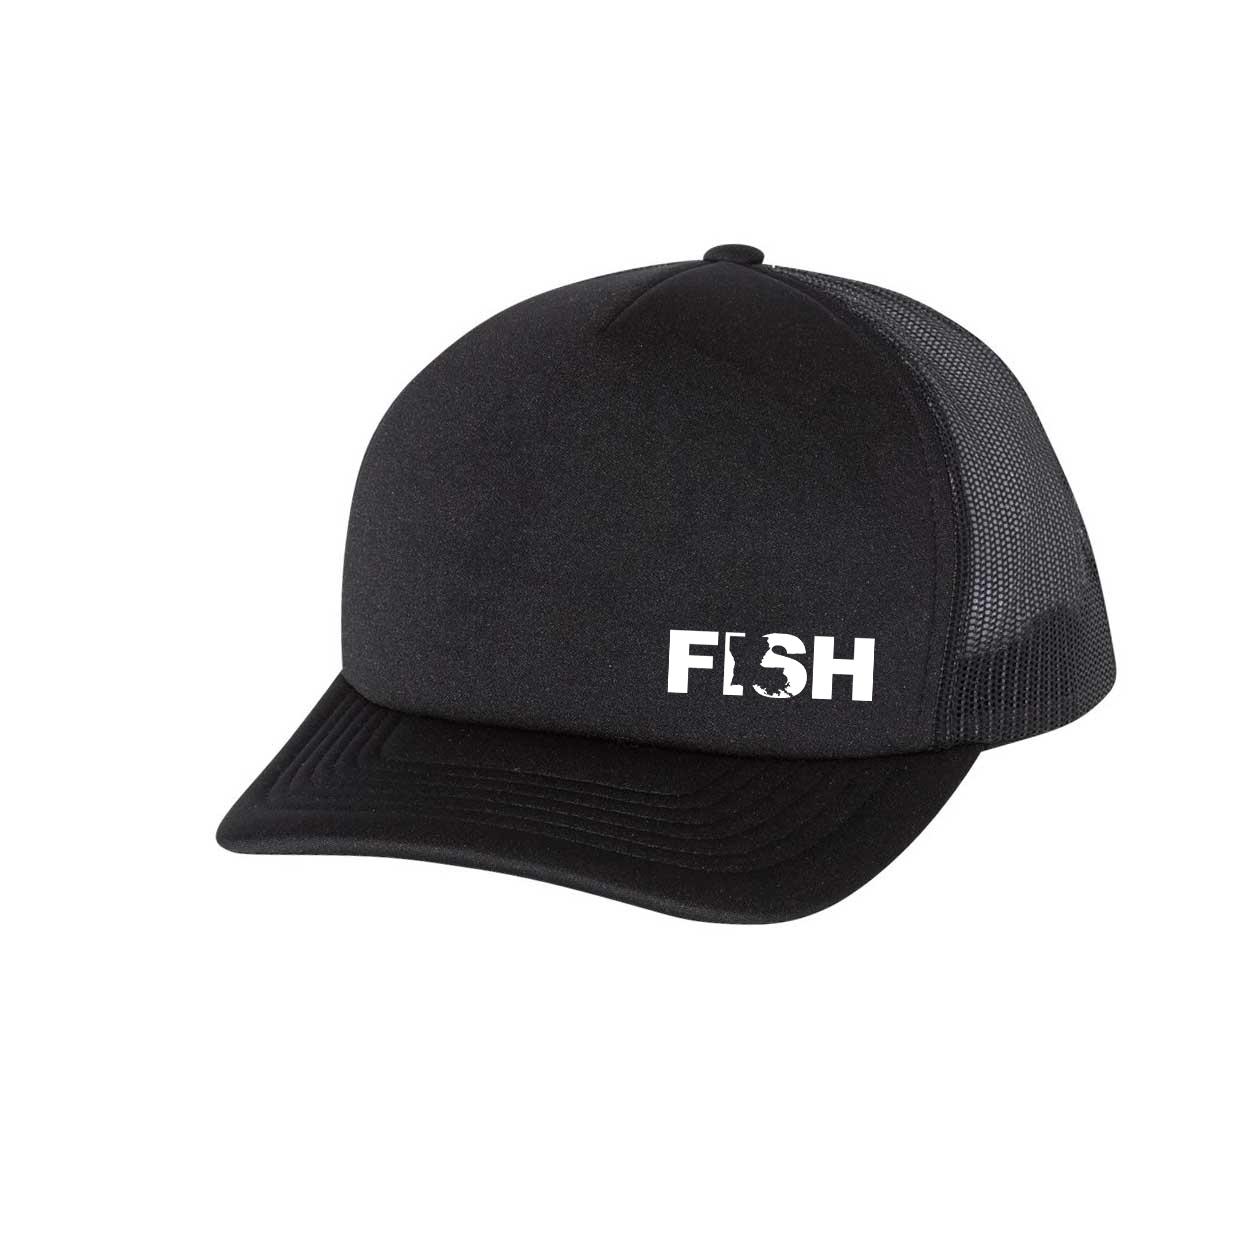 Fish Louisiana Night Out Premium Foam Trucker Snapback Hat Black (White Logo)